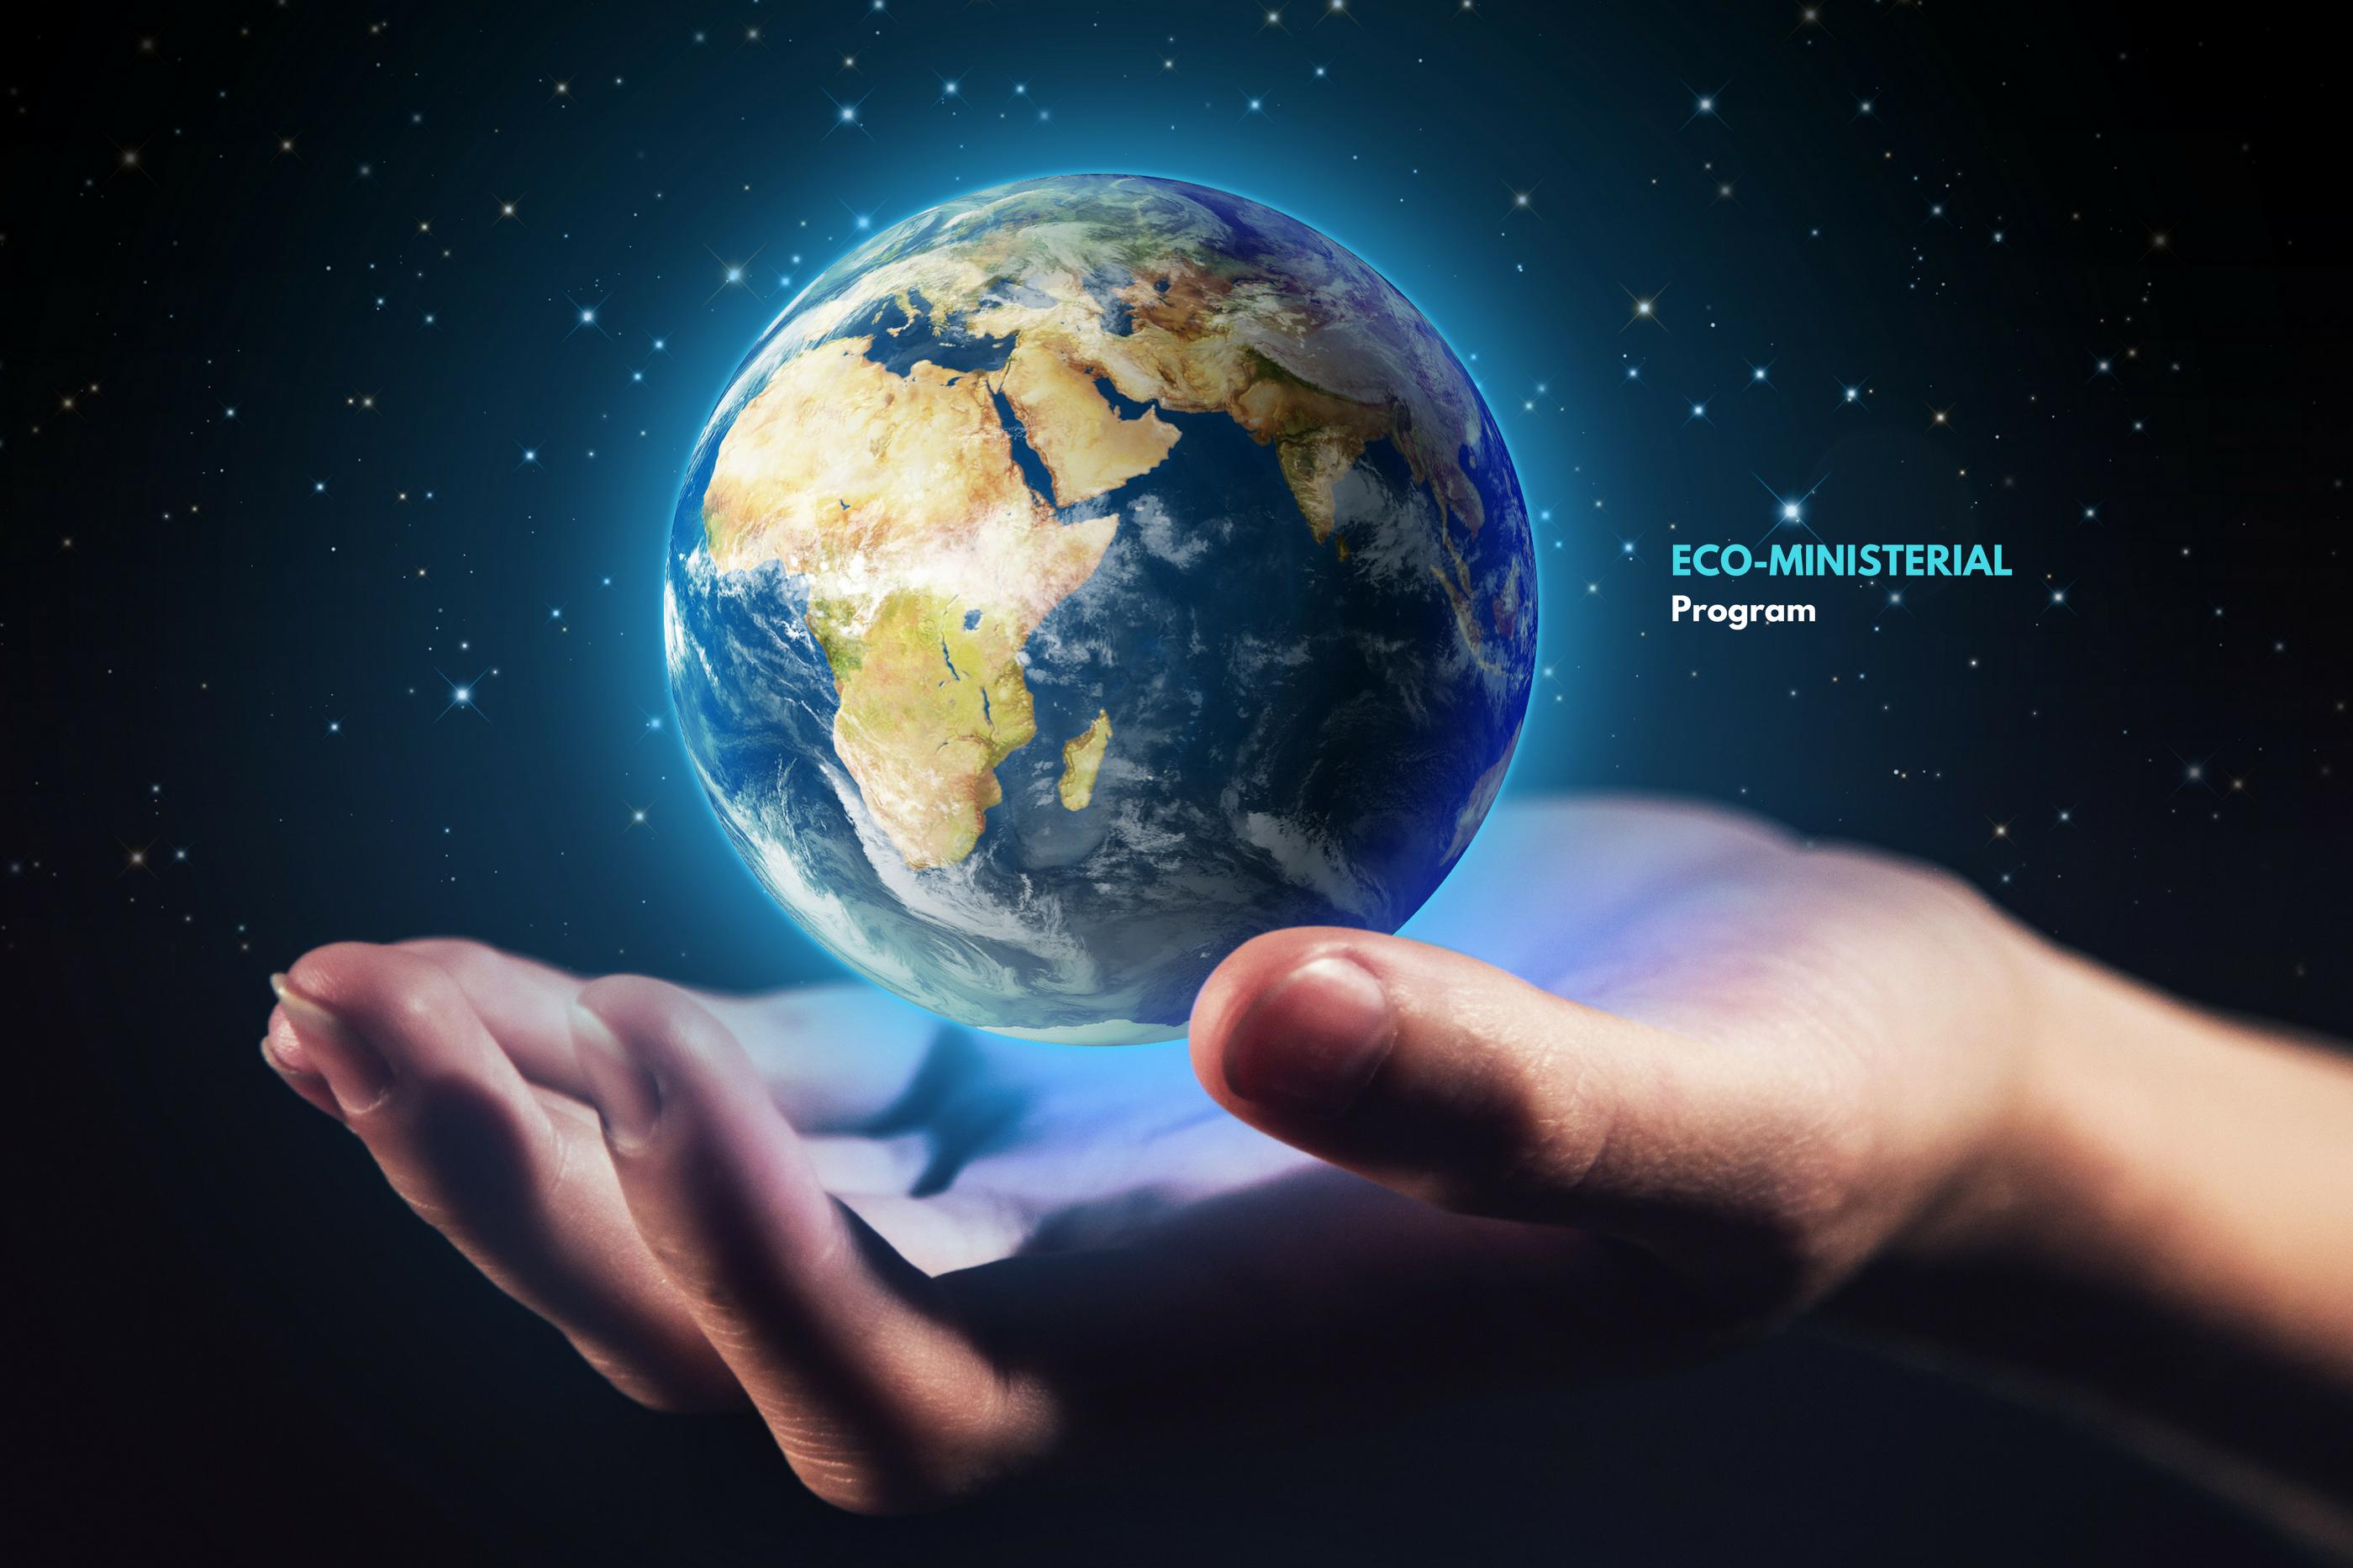 Eco-Ministerial Program (1)